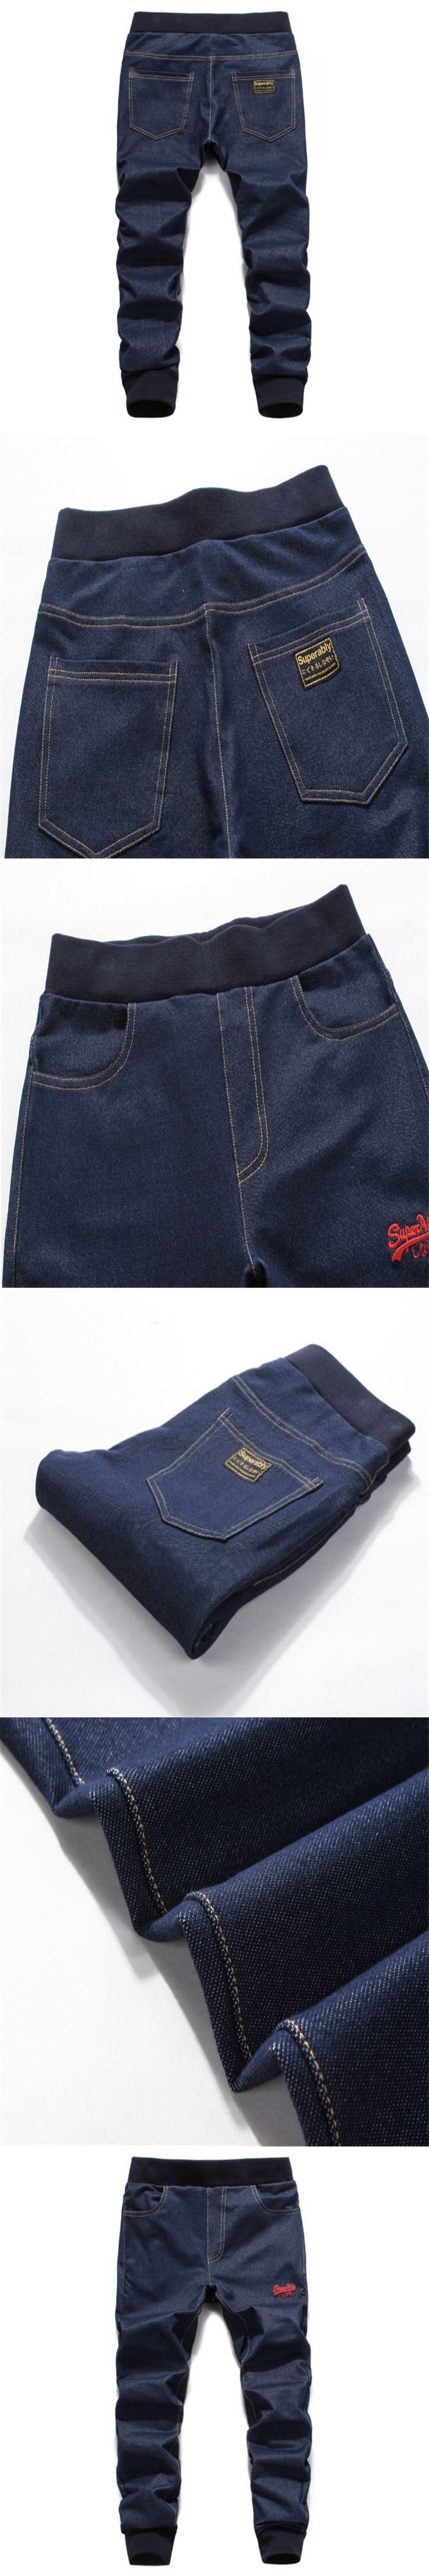 2017  Street Fashion Men Jeans Dark Blue Color Slim Leg Open Stretch Pants High Quality Jogger Jeans Men Youth Wear